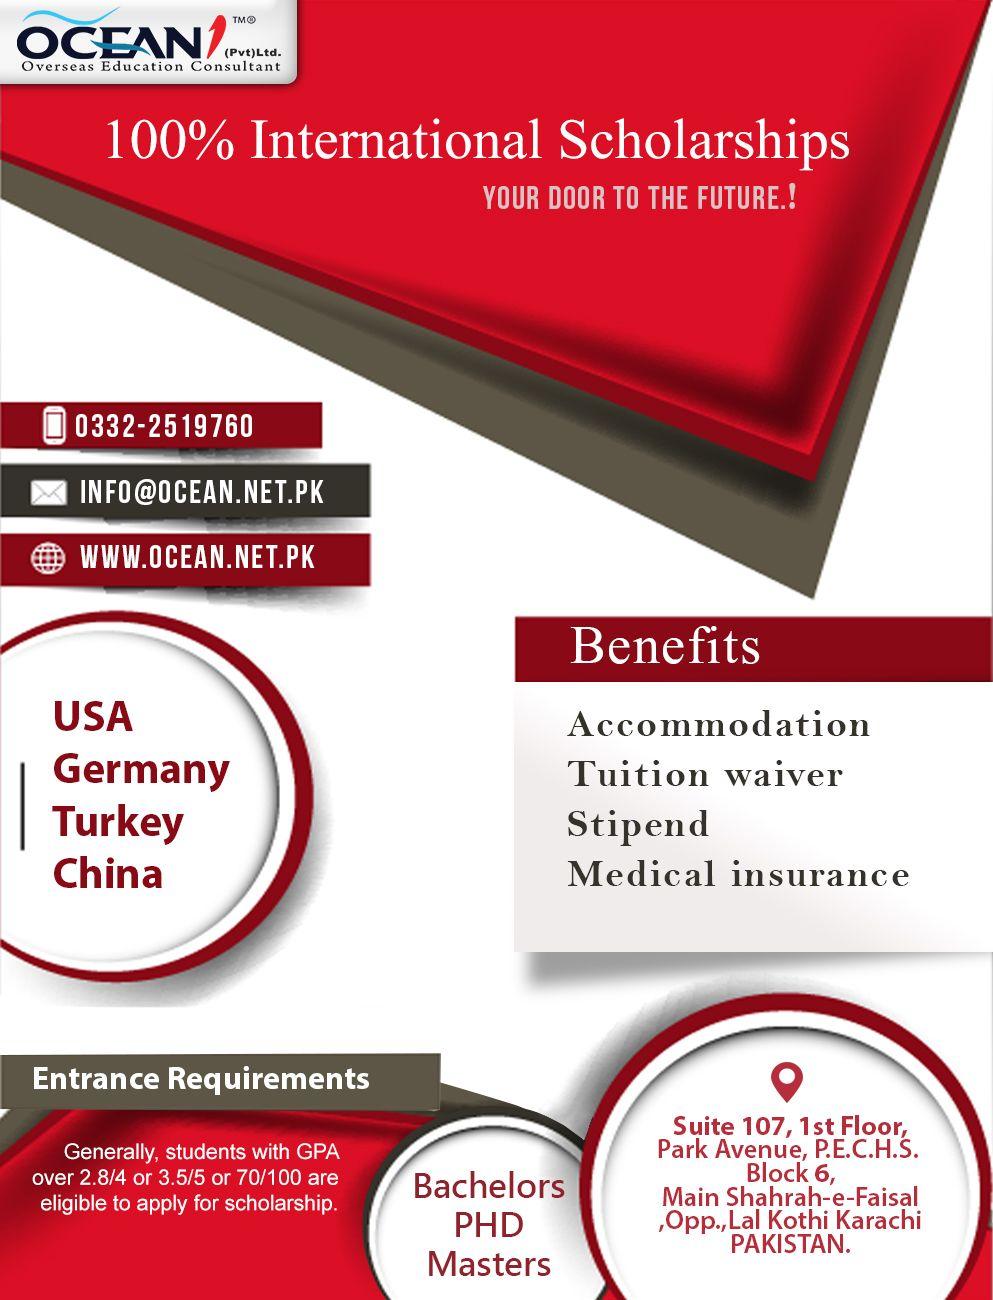 Pin By Ocean1pvtltd On Overseas Education International Scholarships Educational Consultant Overseas Education